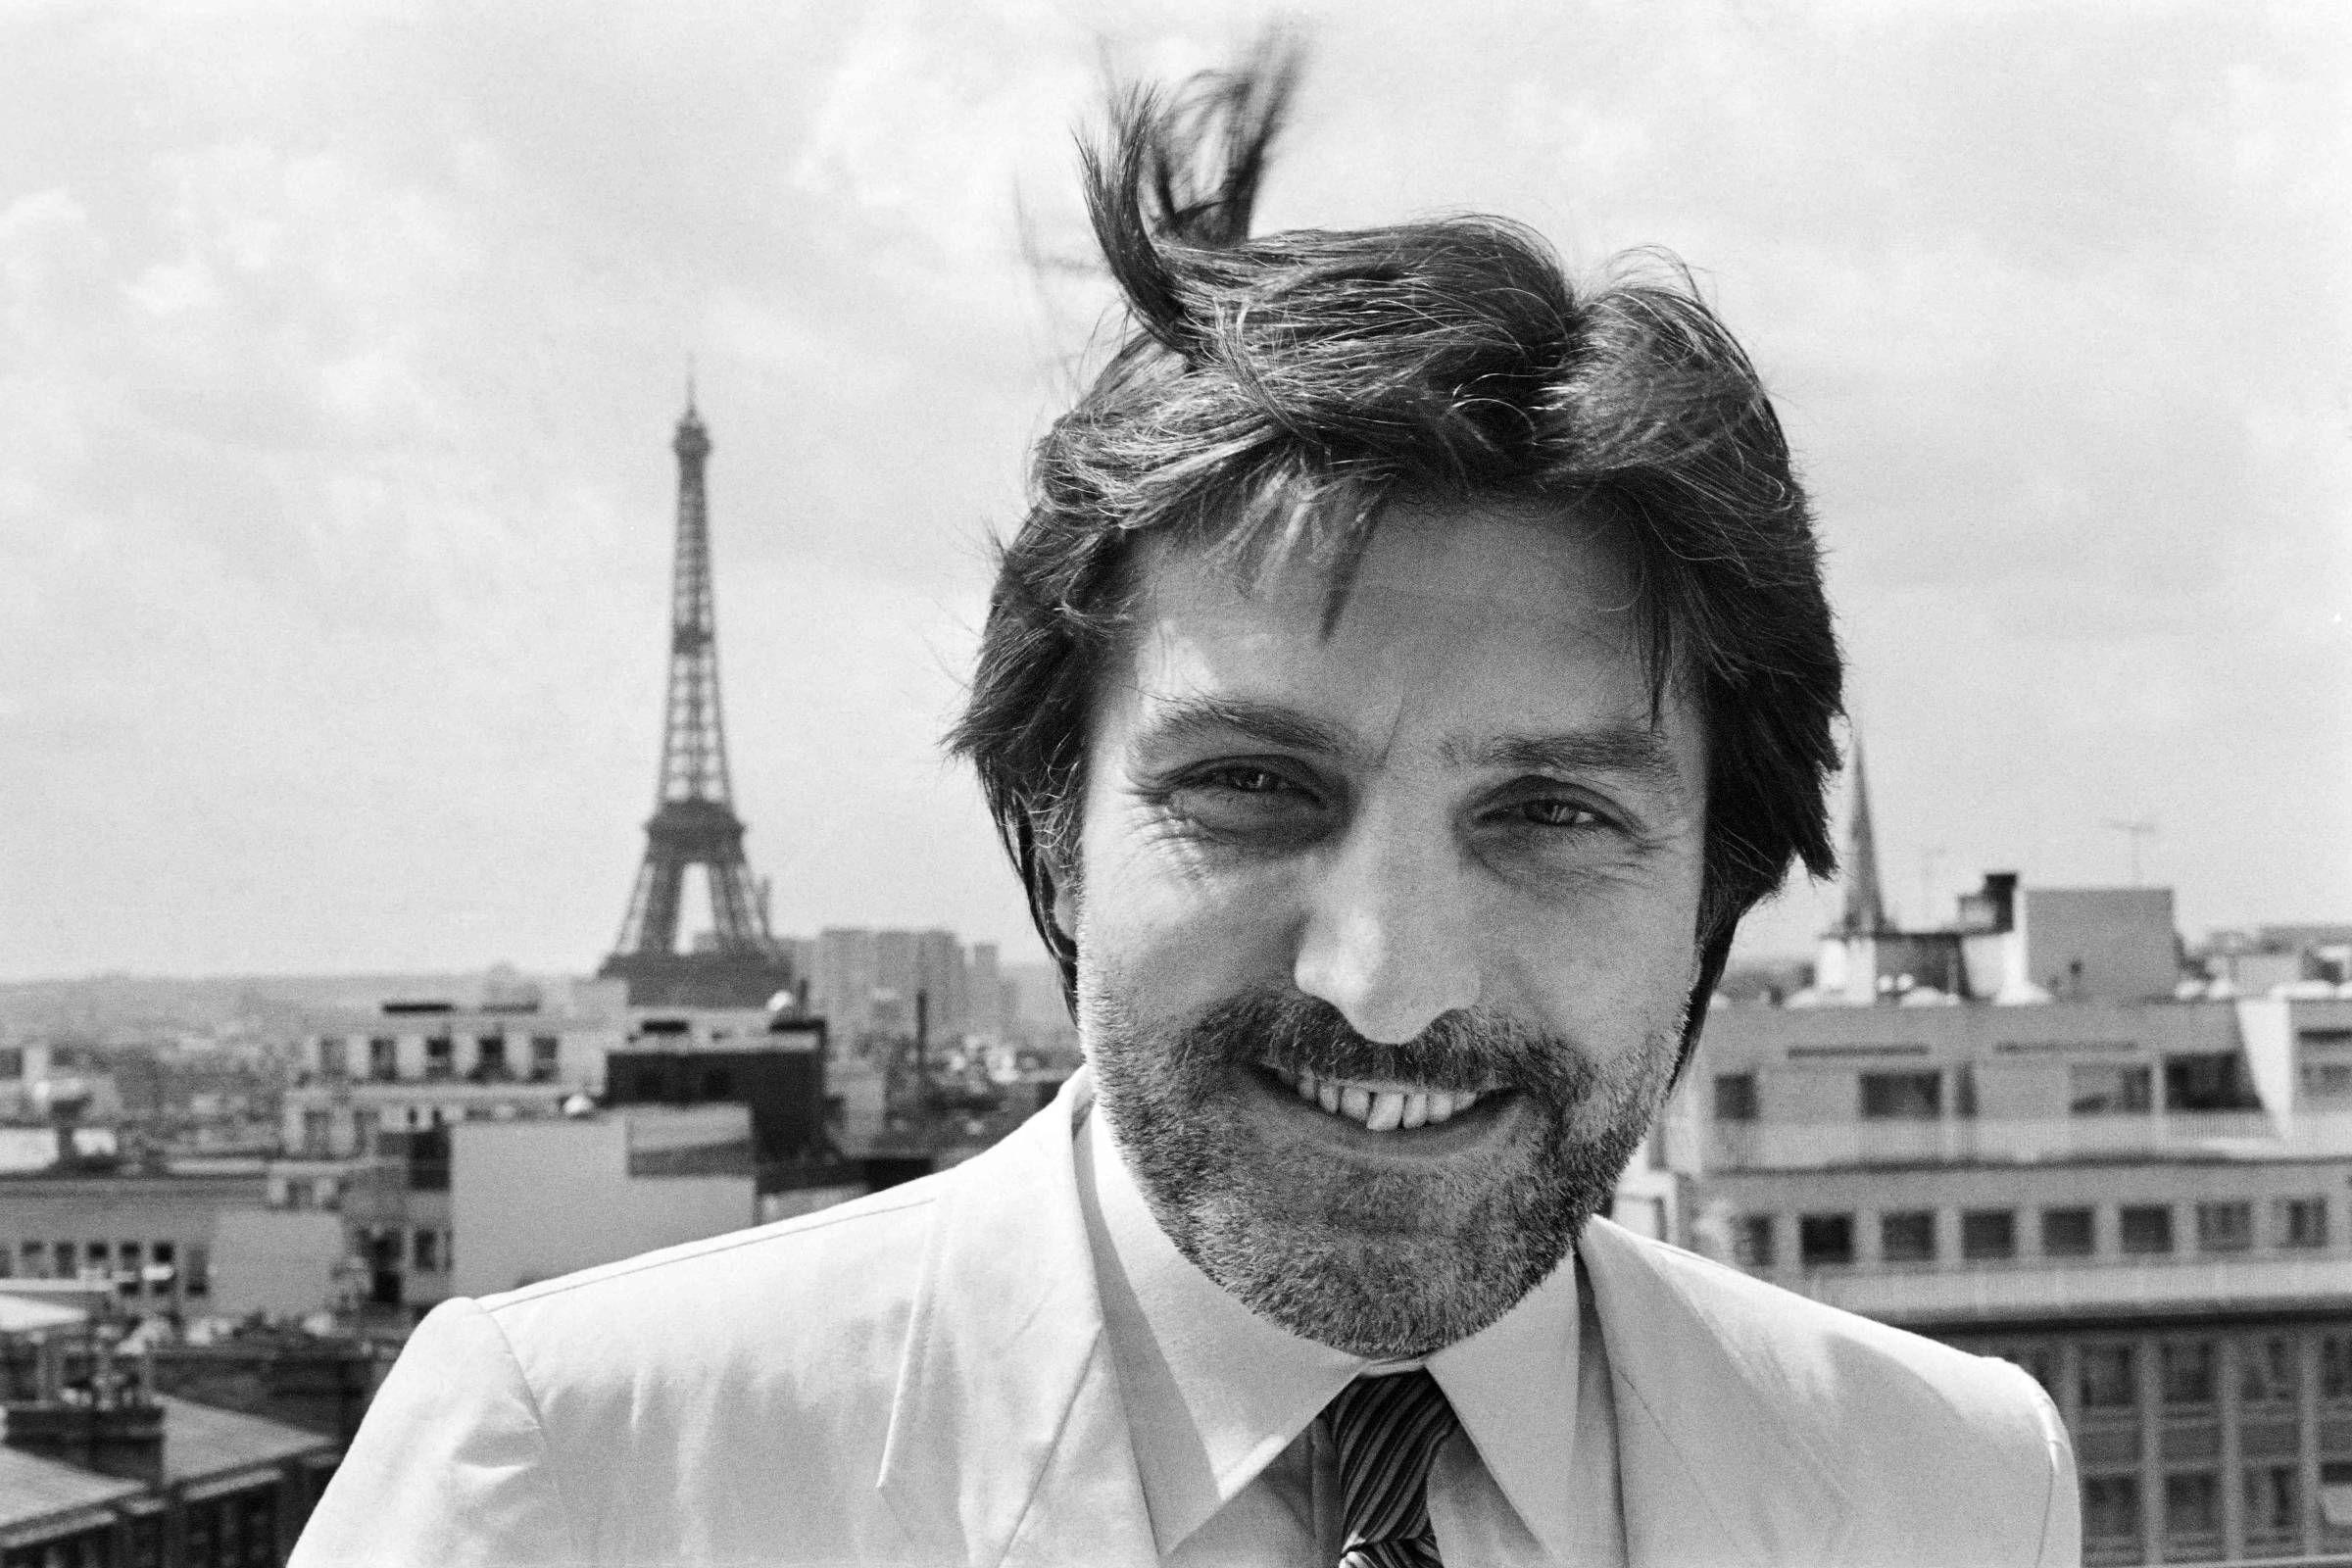 French Fashion Designer Emanuel Ungaro Has Died In Paris Aged 86 Mercopress